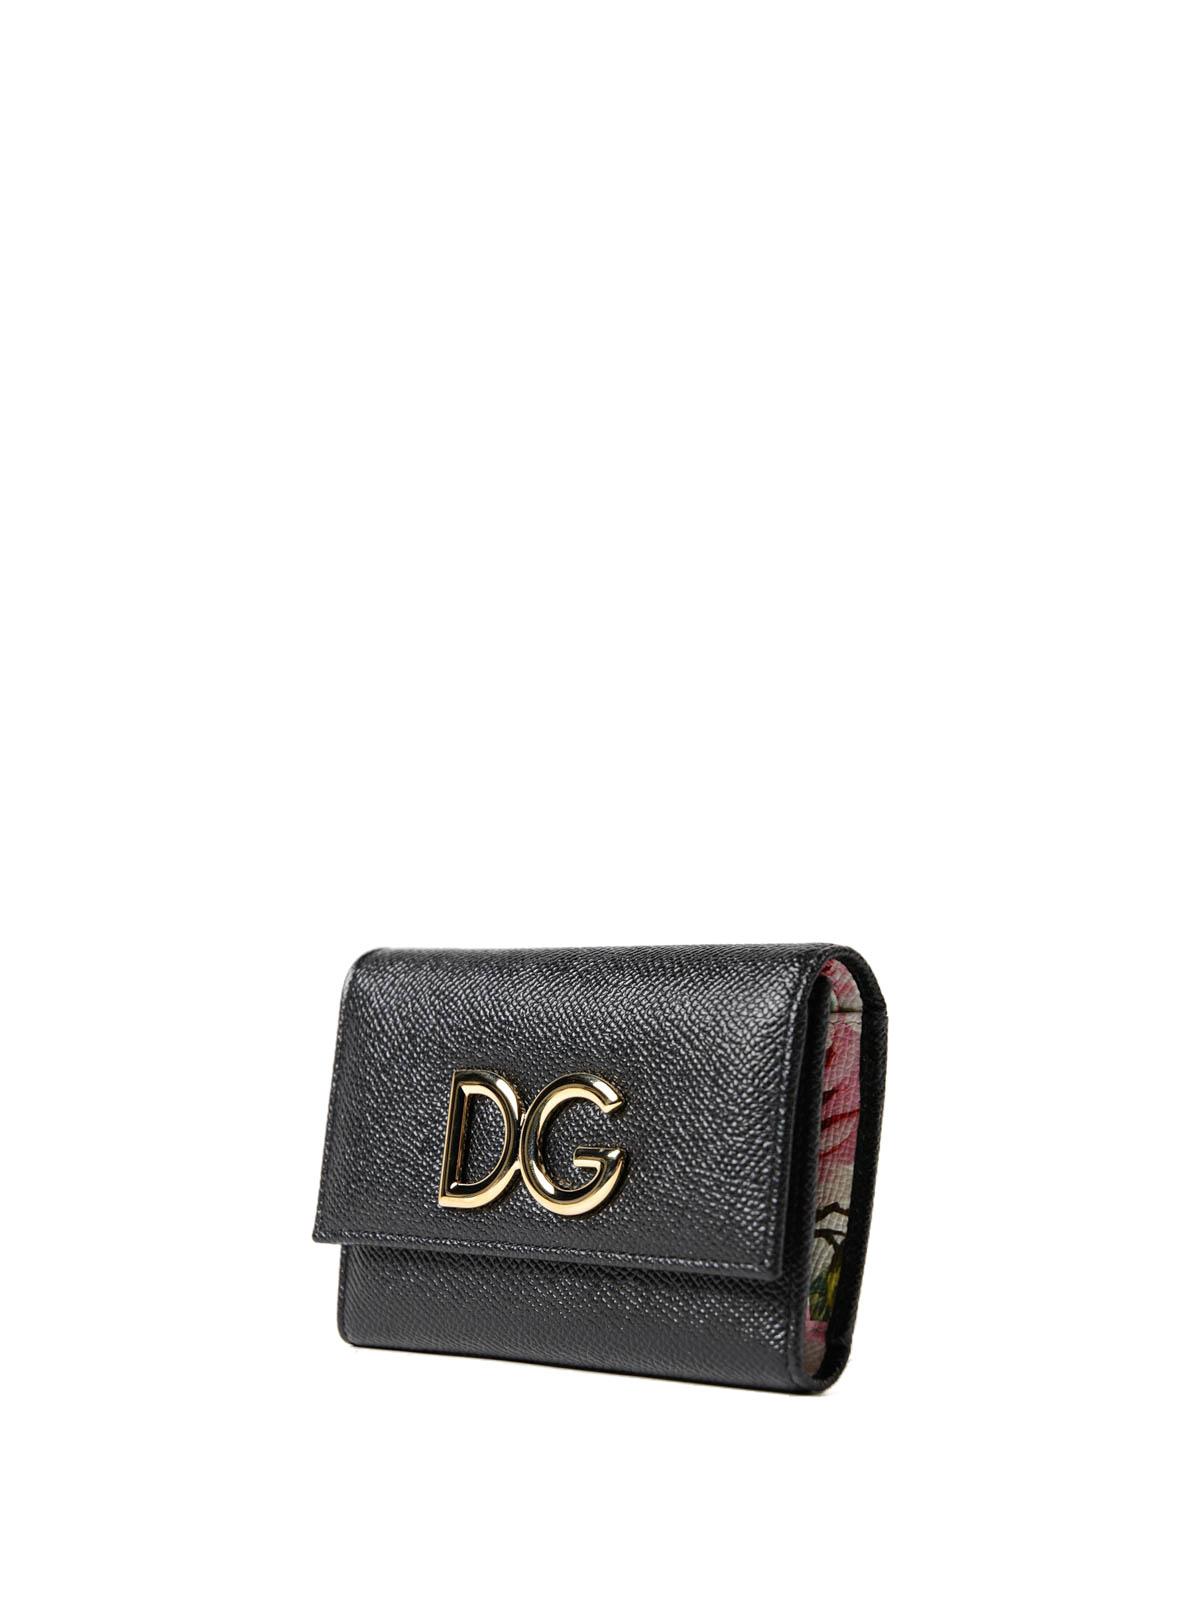 French Flap purse - Black Dolce & Gabbana rADgwy